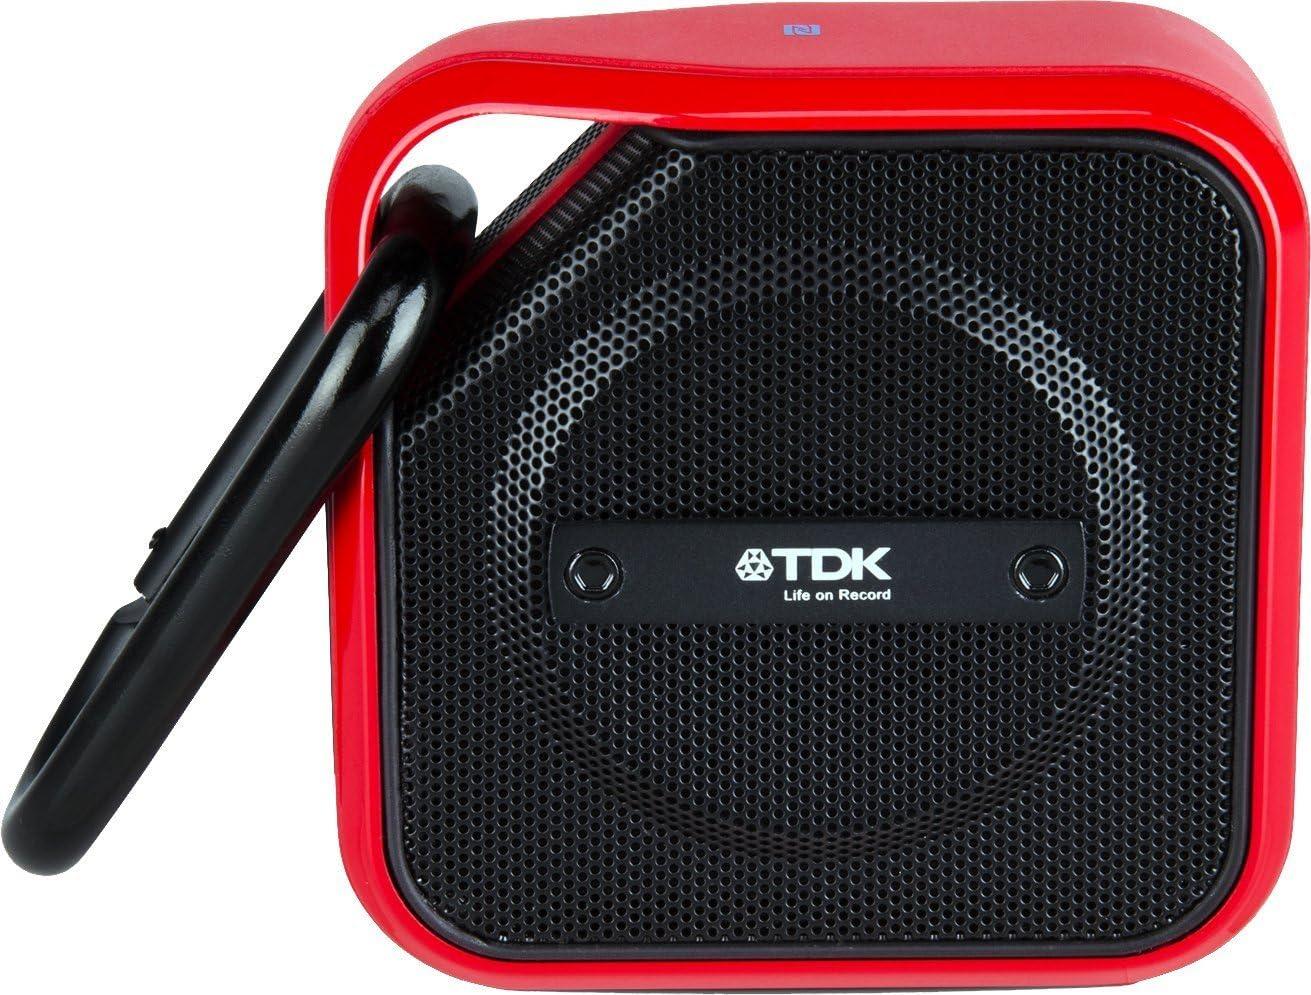 TDK Life On Record Micro A12 Wireless Bluetooth Speaker